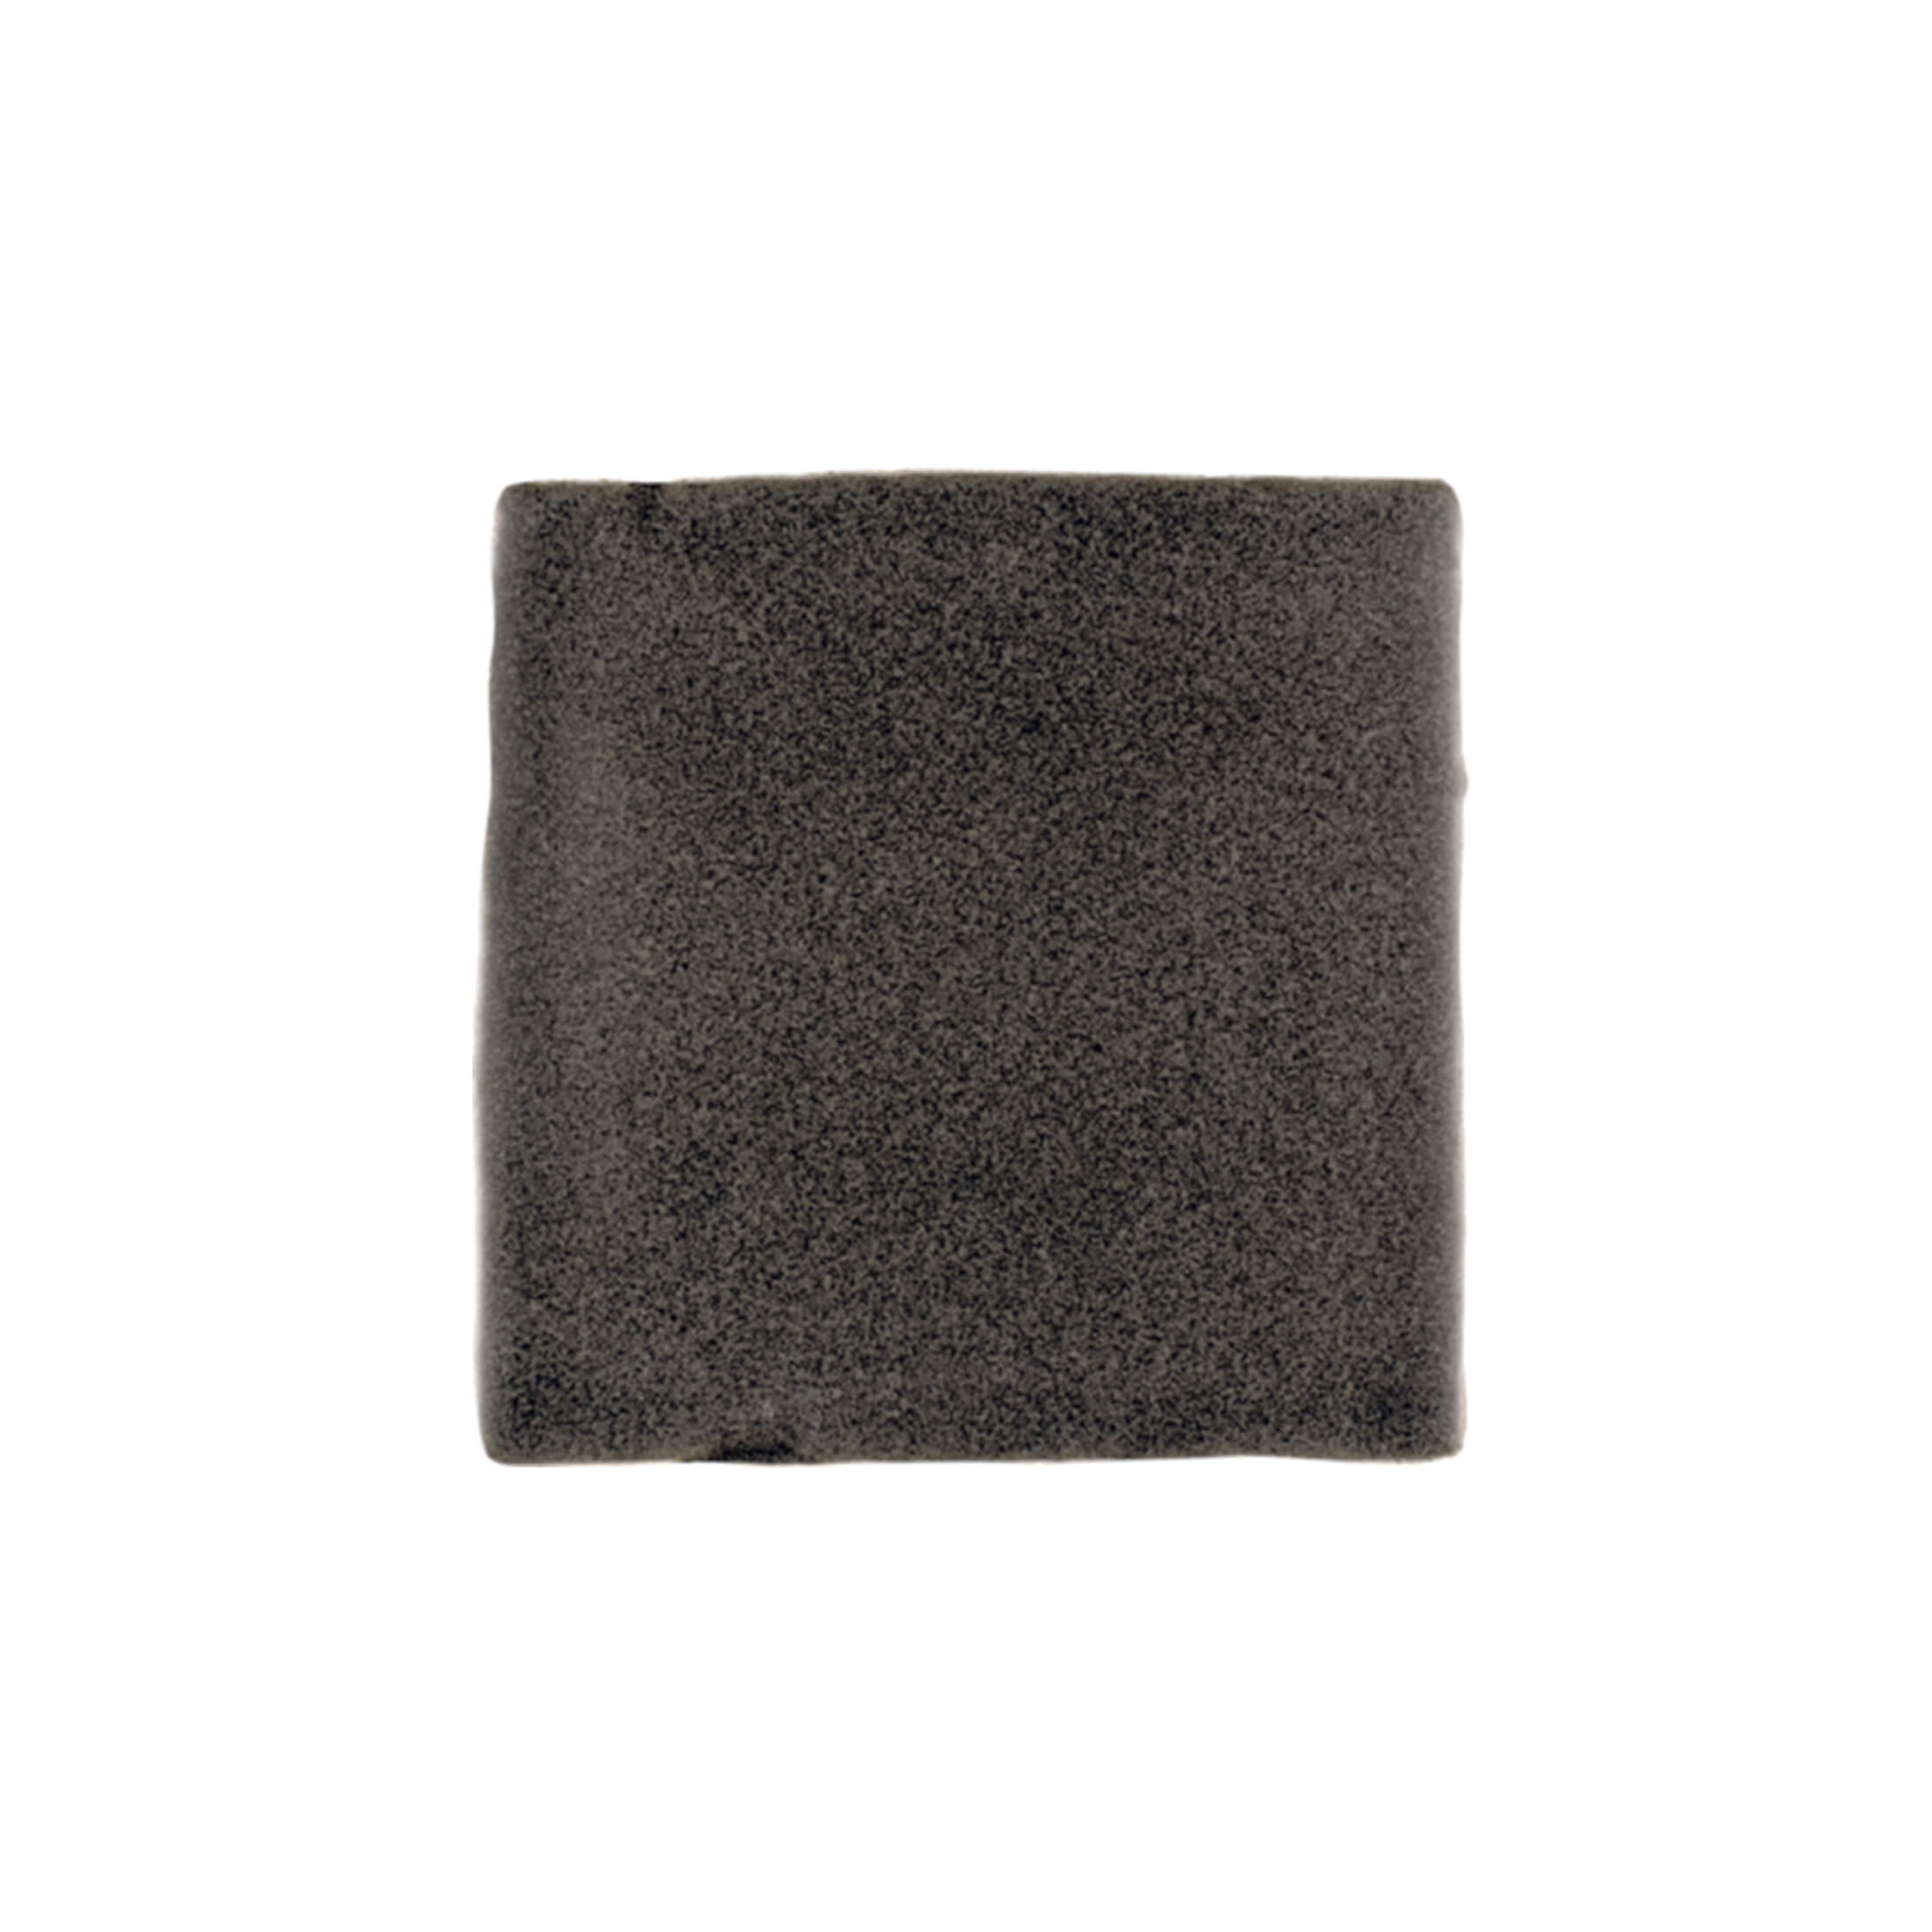 ADNT1001 - LISO  - 15 cm X 15 cm